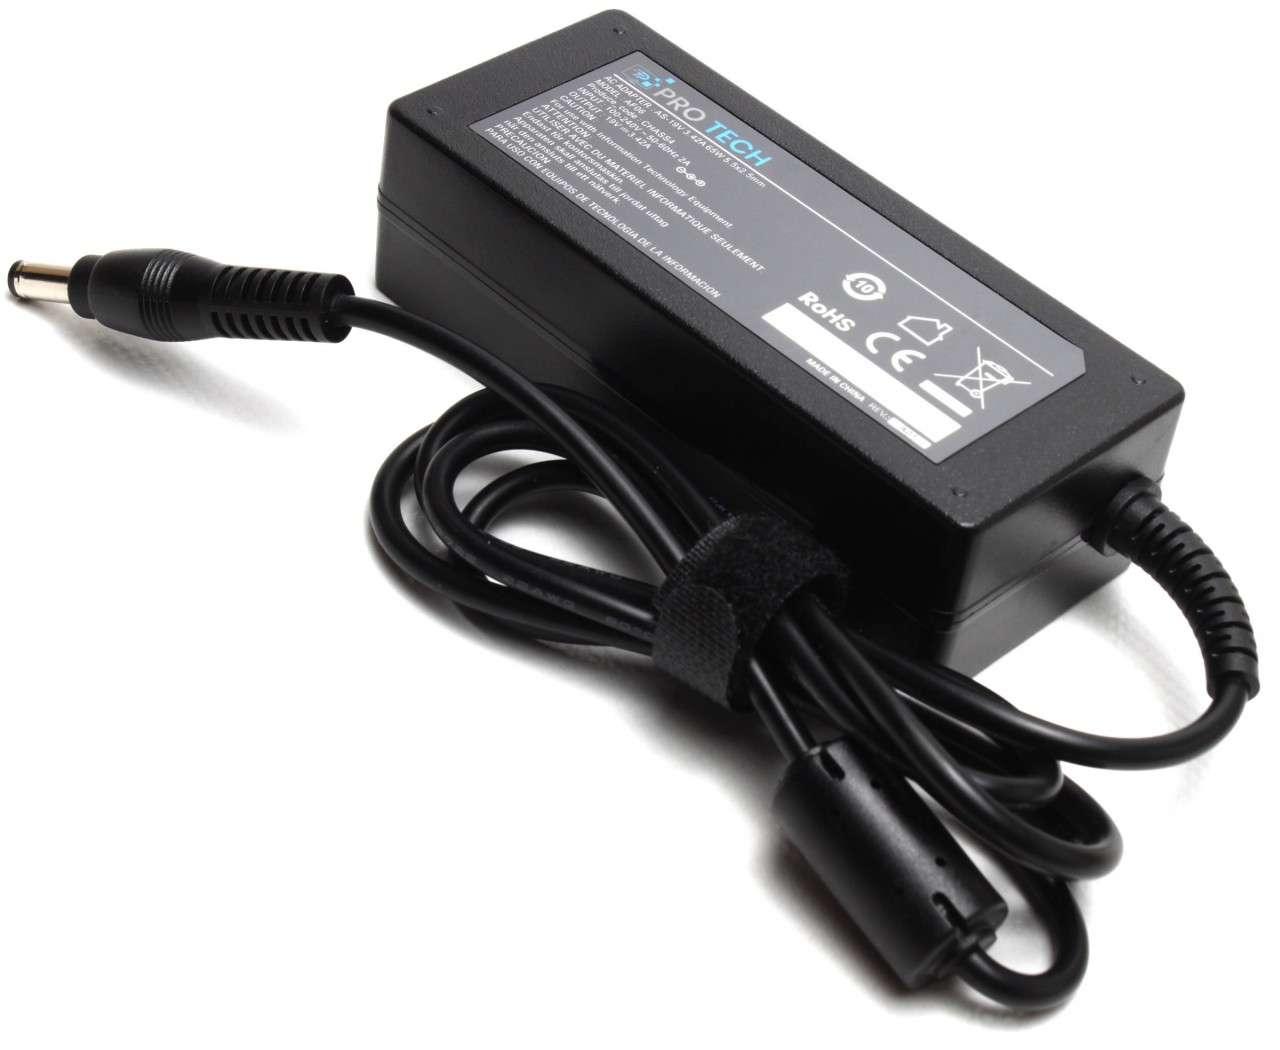 Incarcator MSI MS 168A Replacement imagine powerlaptop.ro 2021